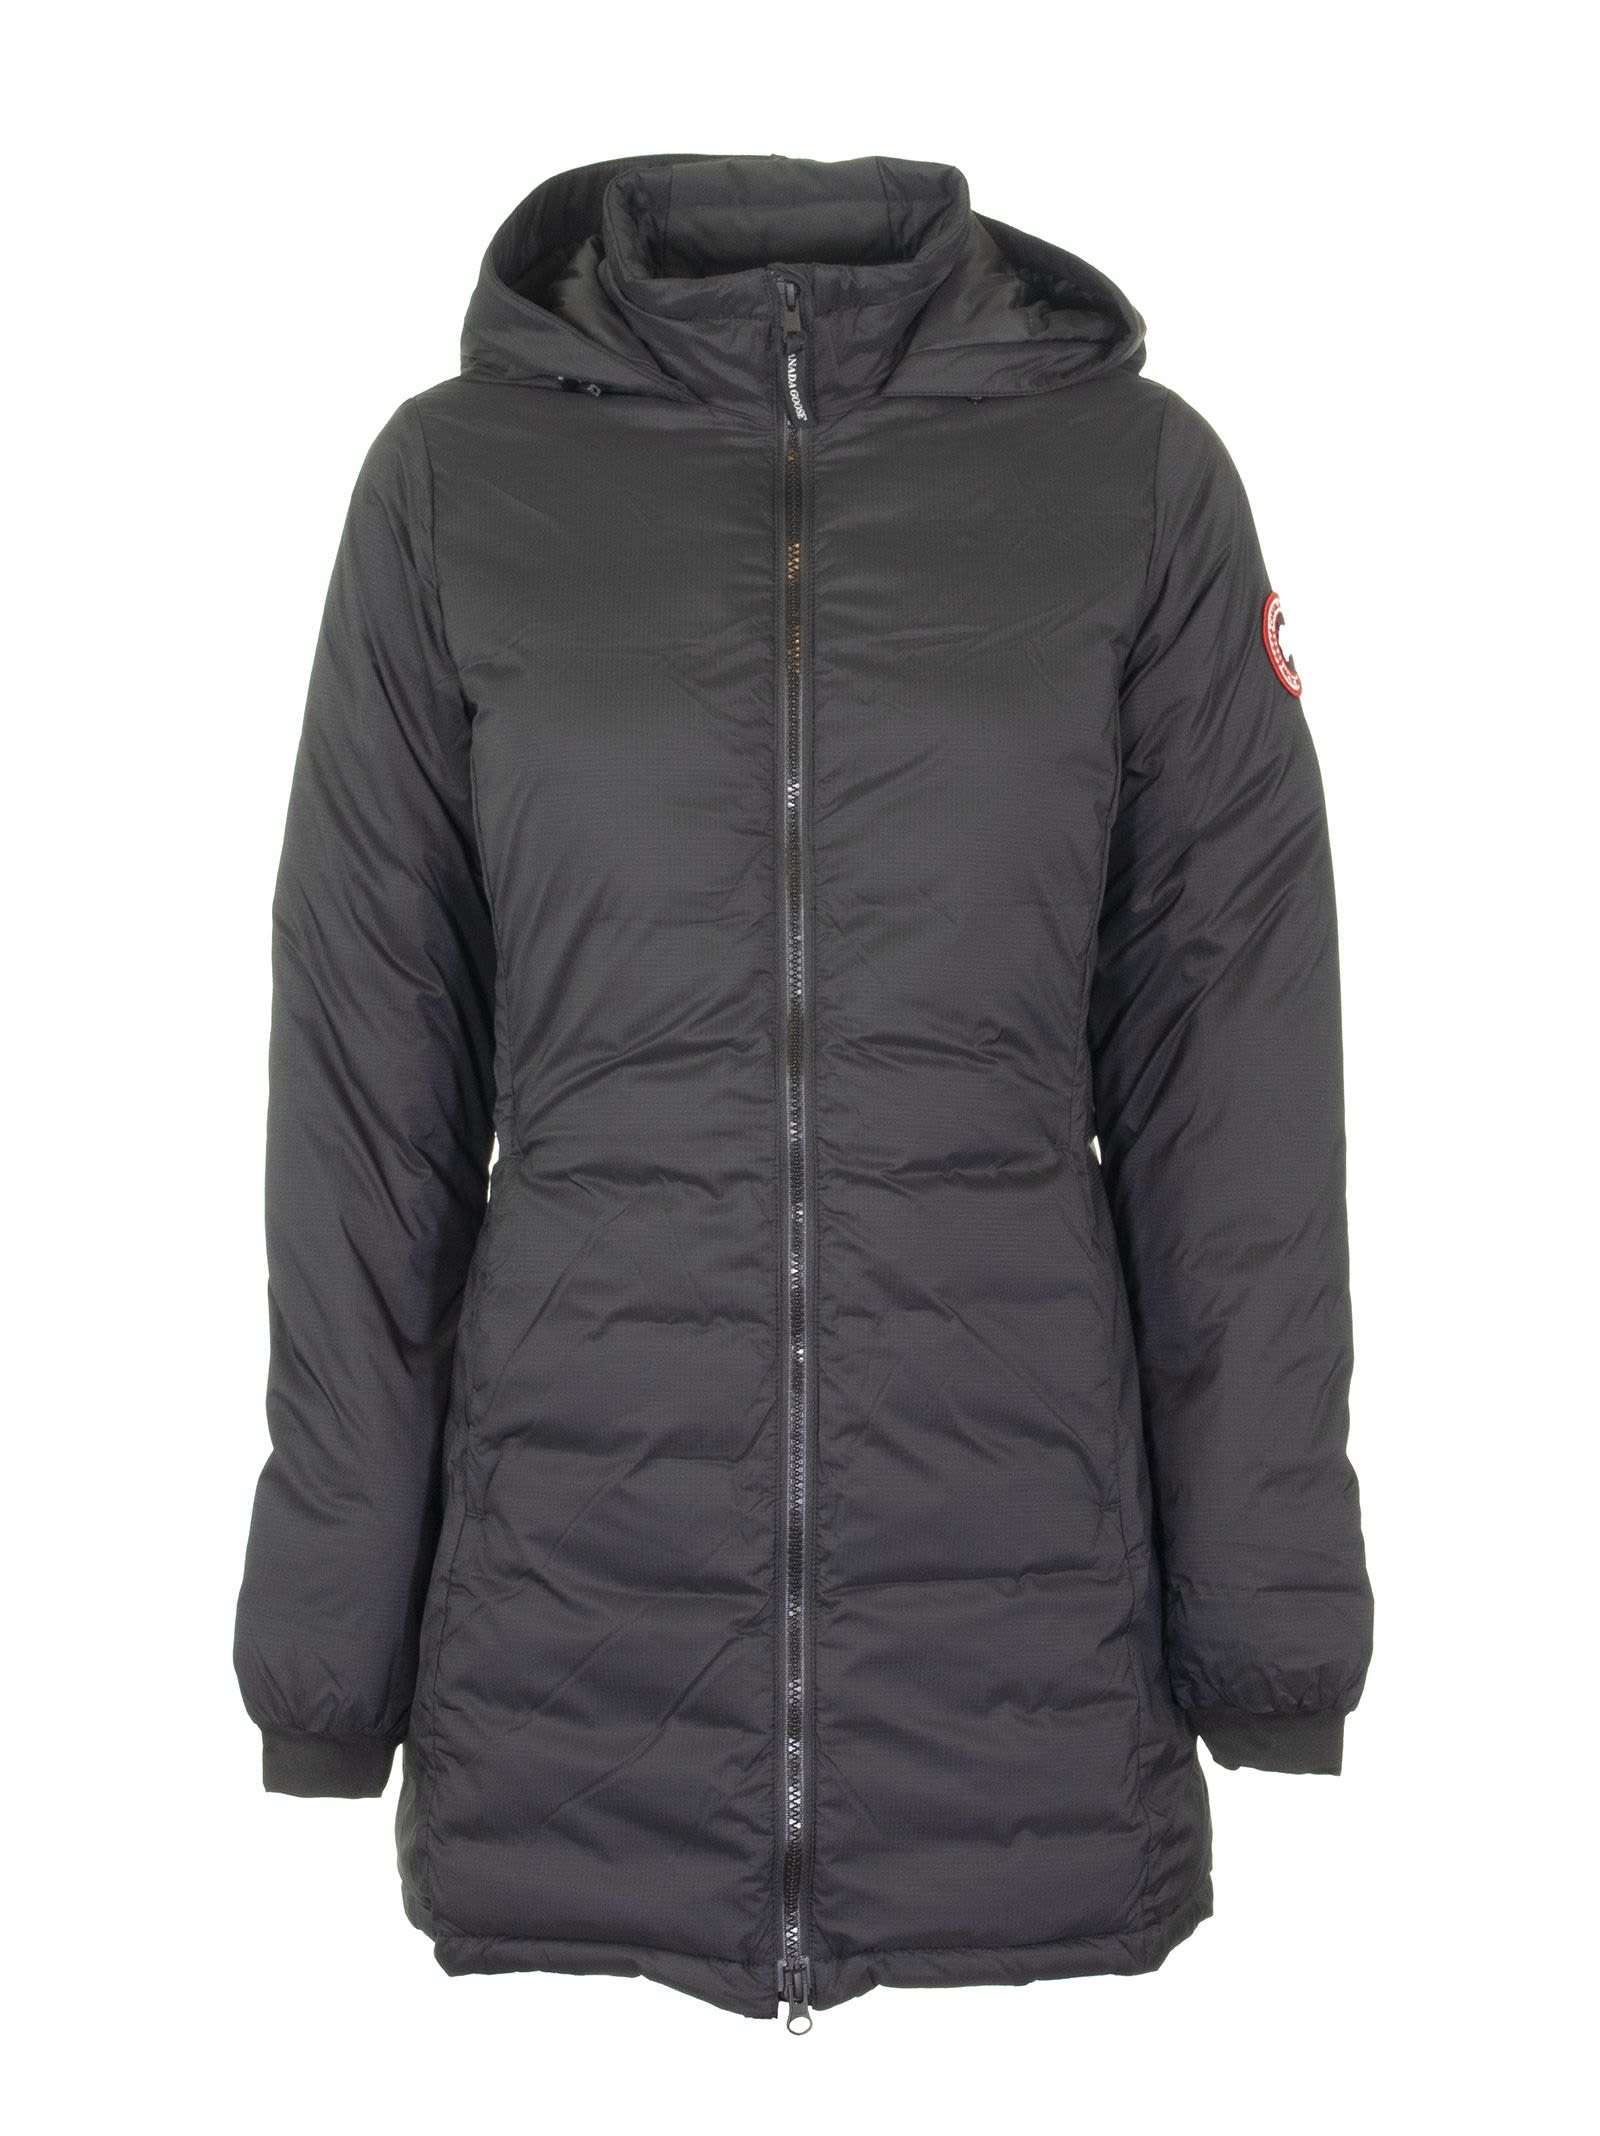 Canada Goose Camp Hooded Jacket Matte Finish Black